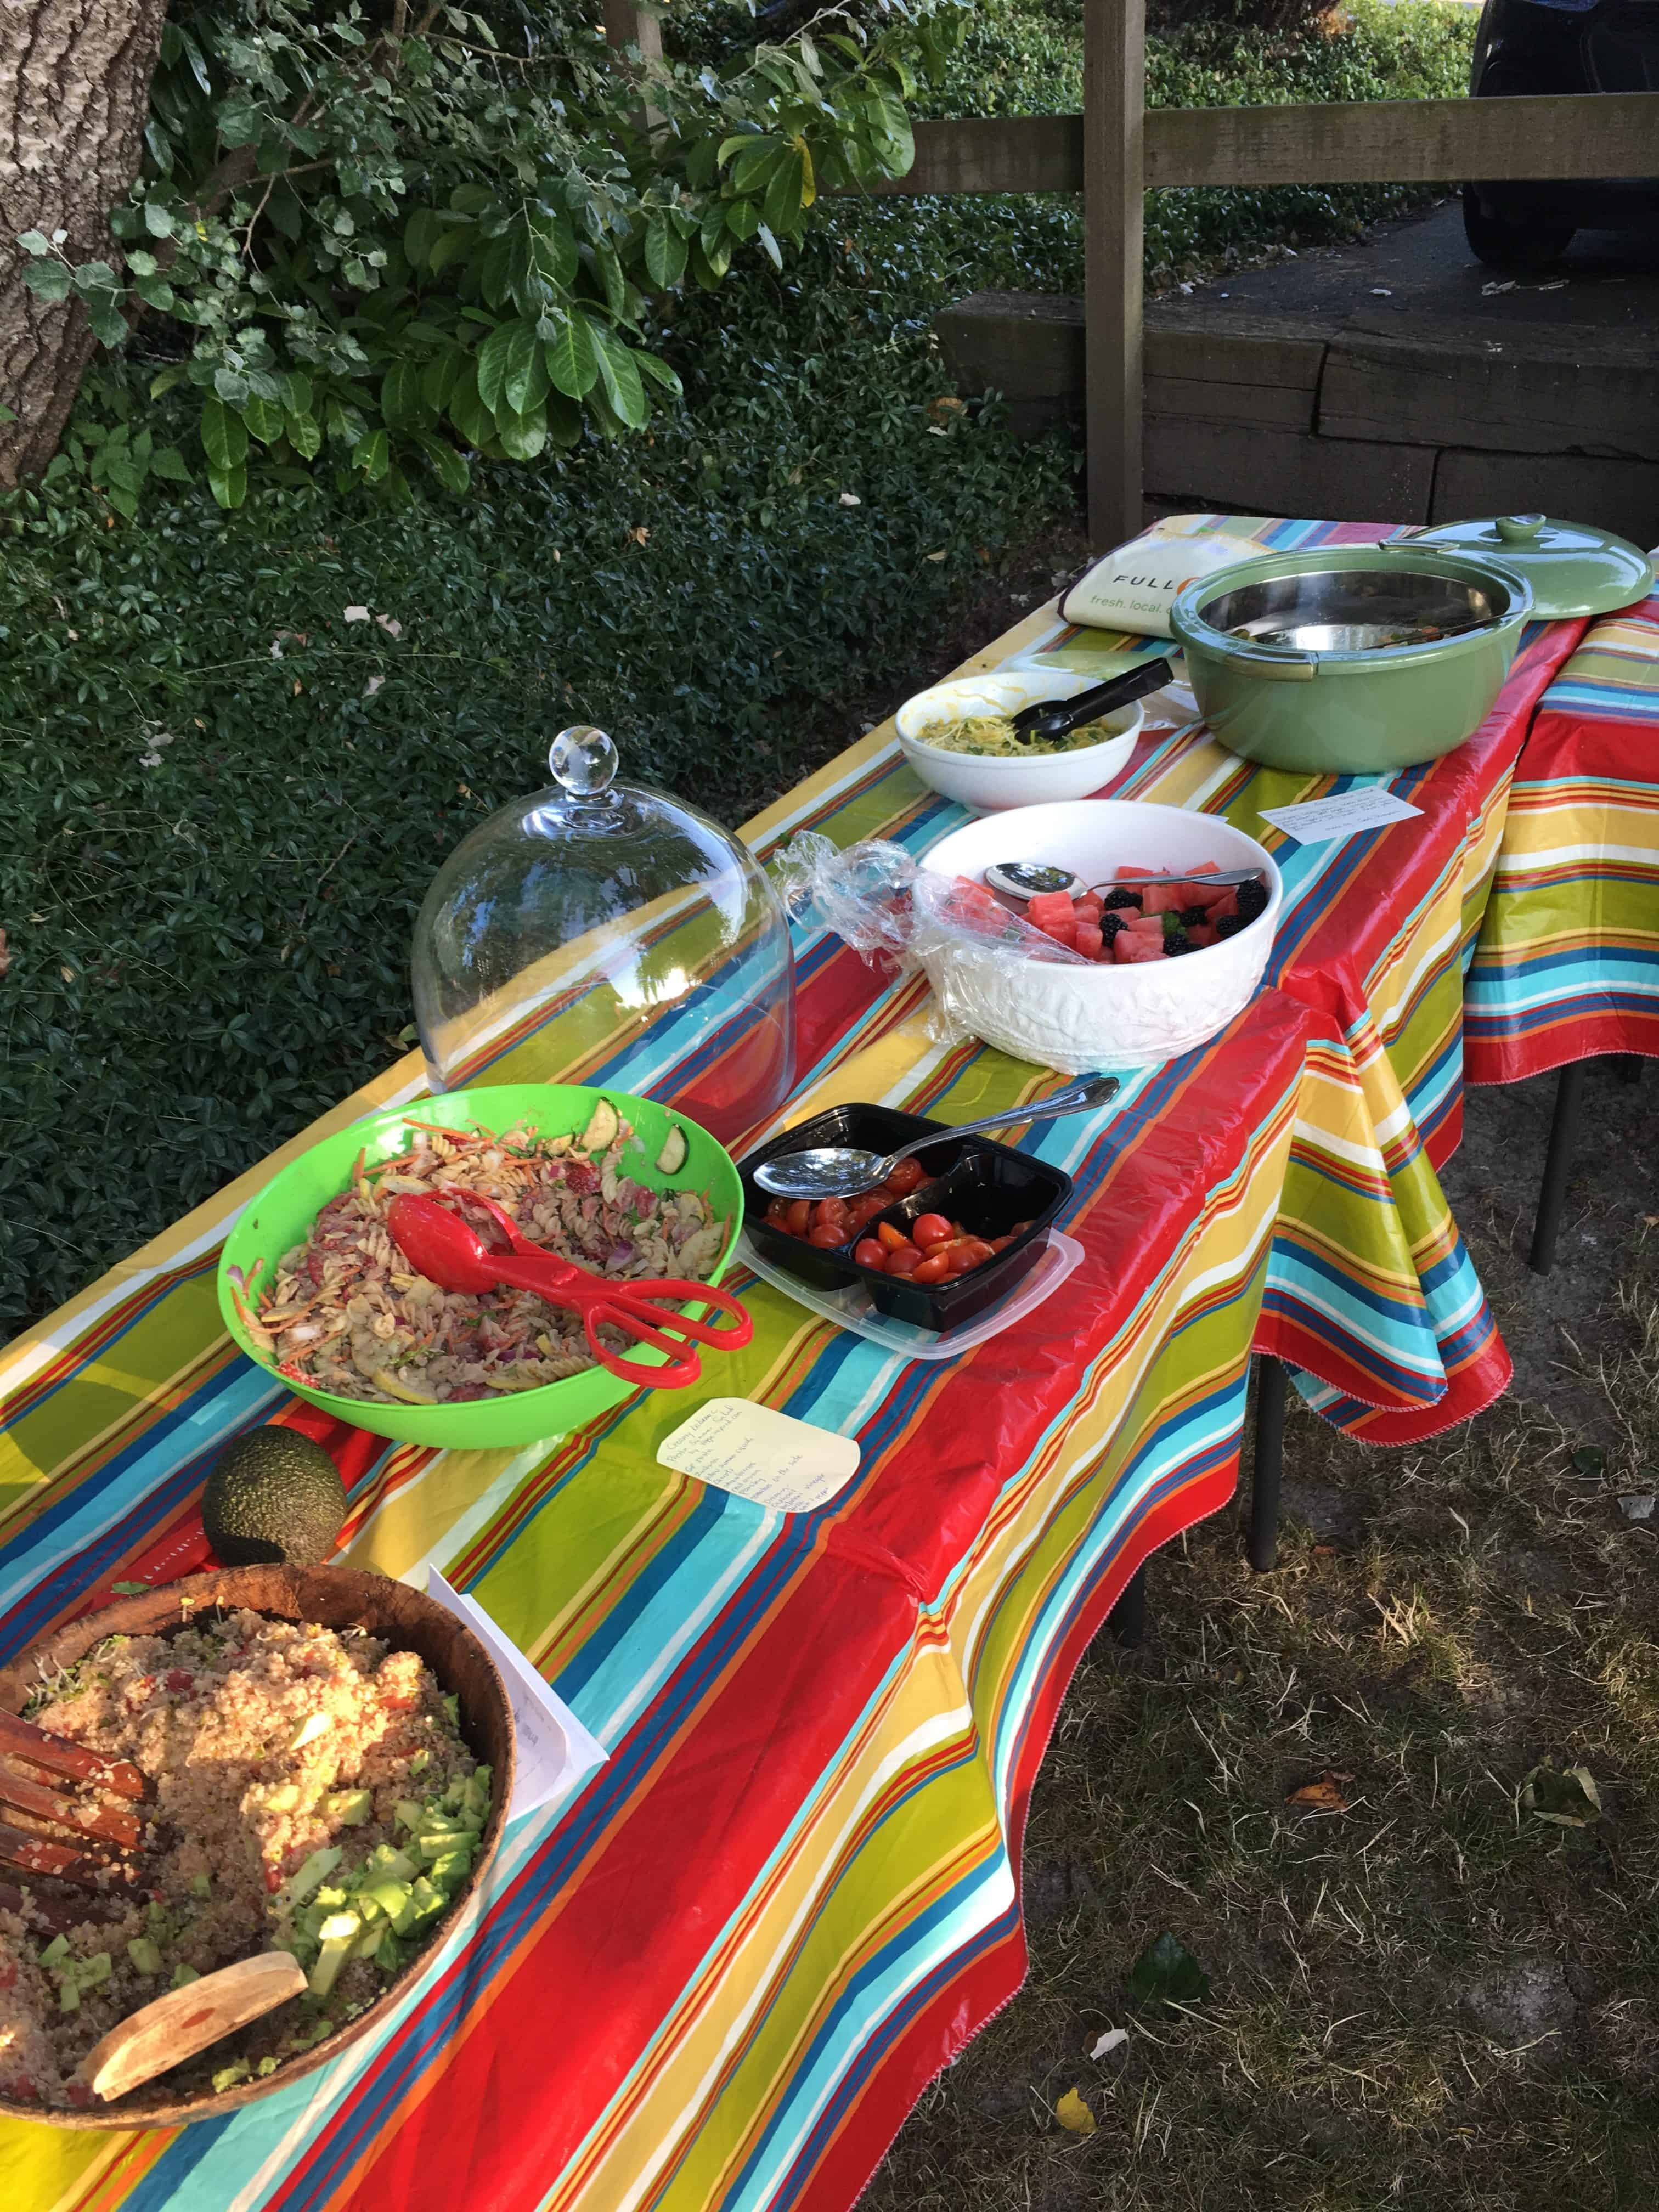 Great spread at Sno-Valley Vegan Potluck. https://trimazing.com/